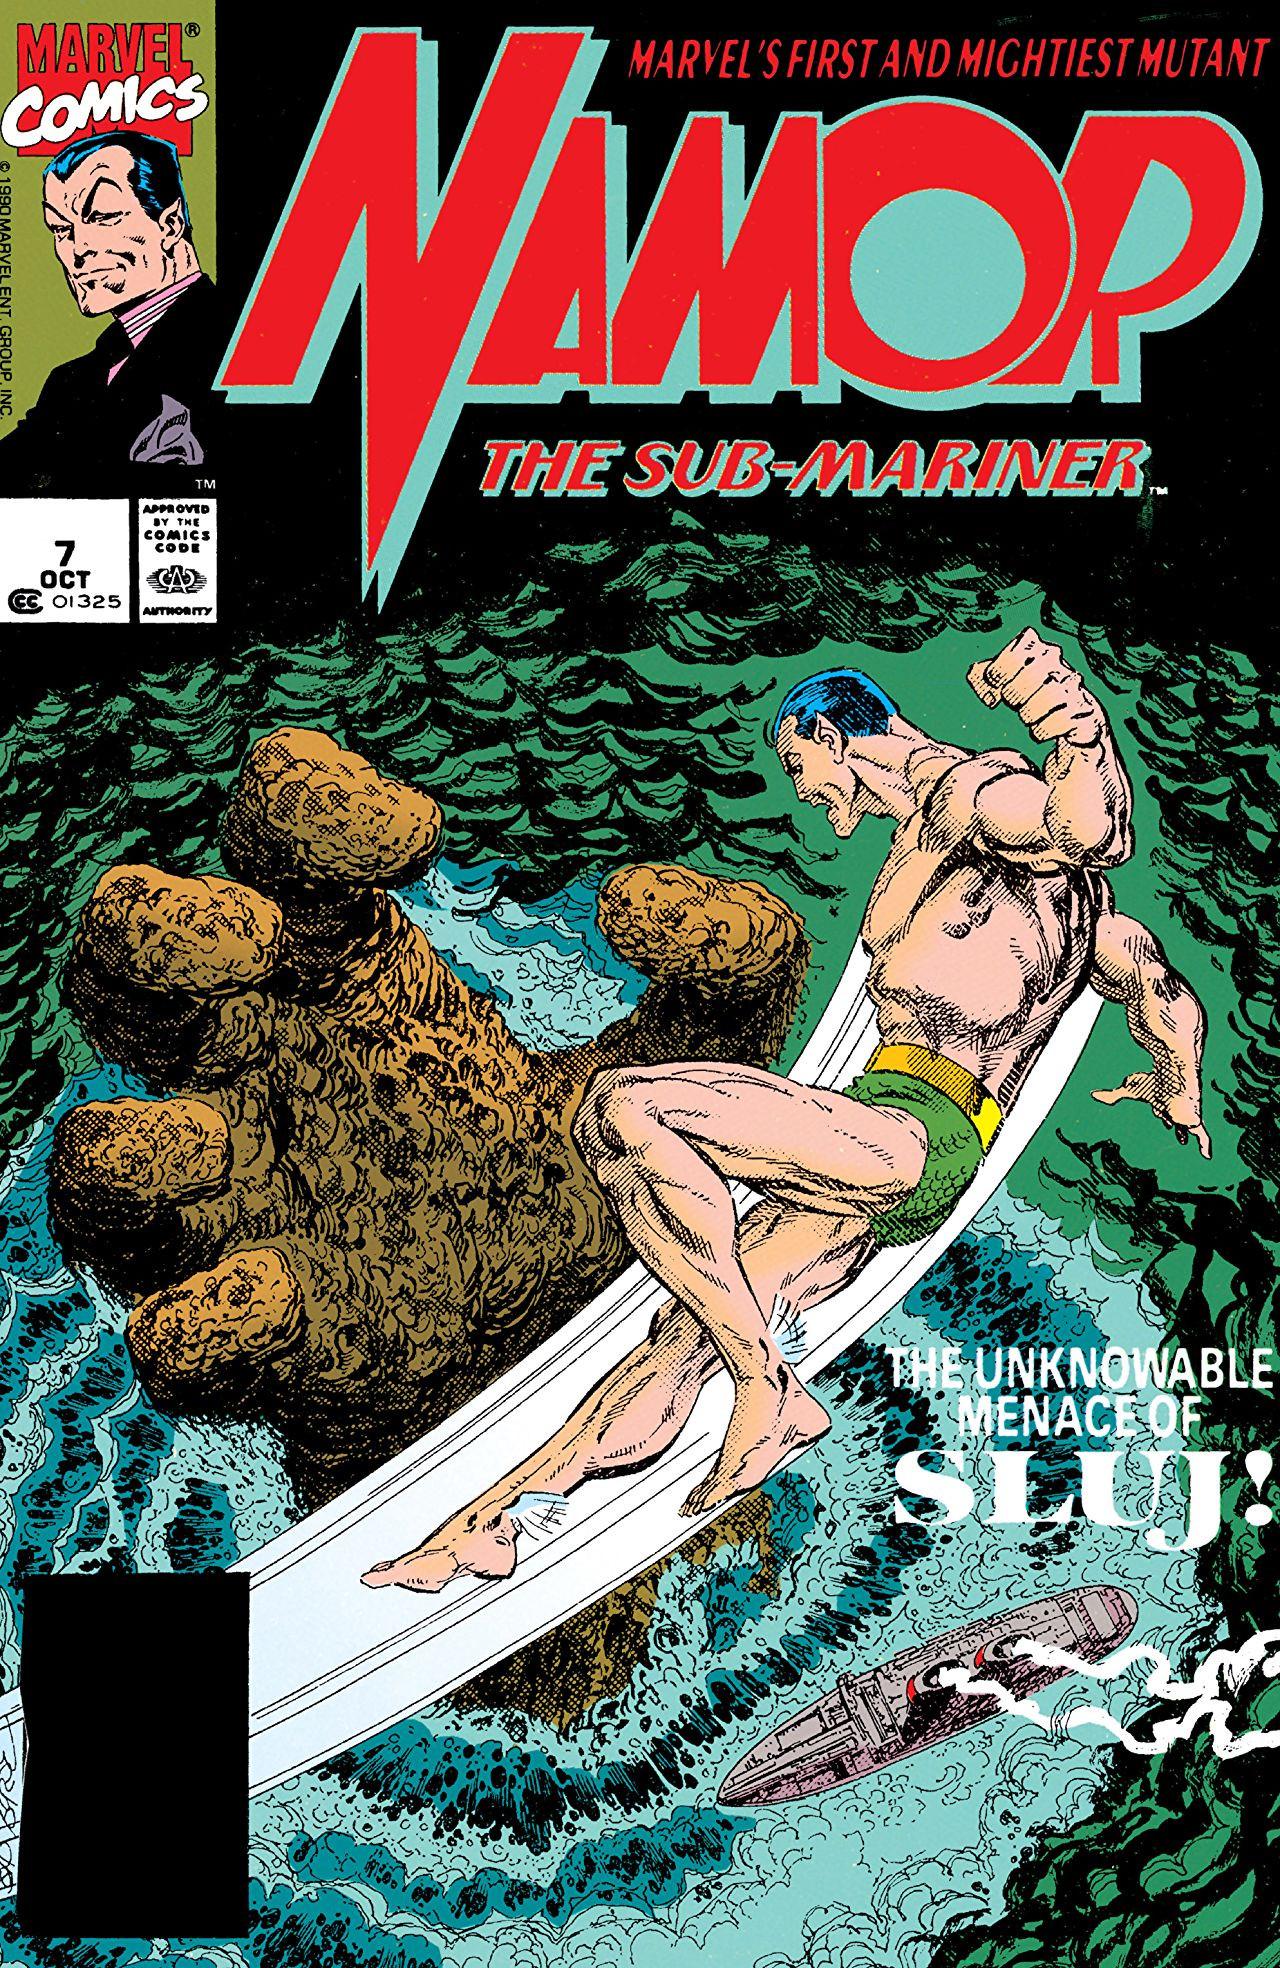 Namor the Sub-Mariner Vol 1 7